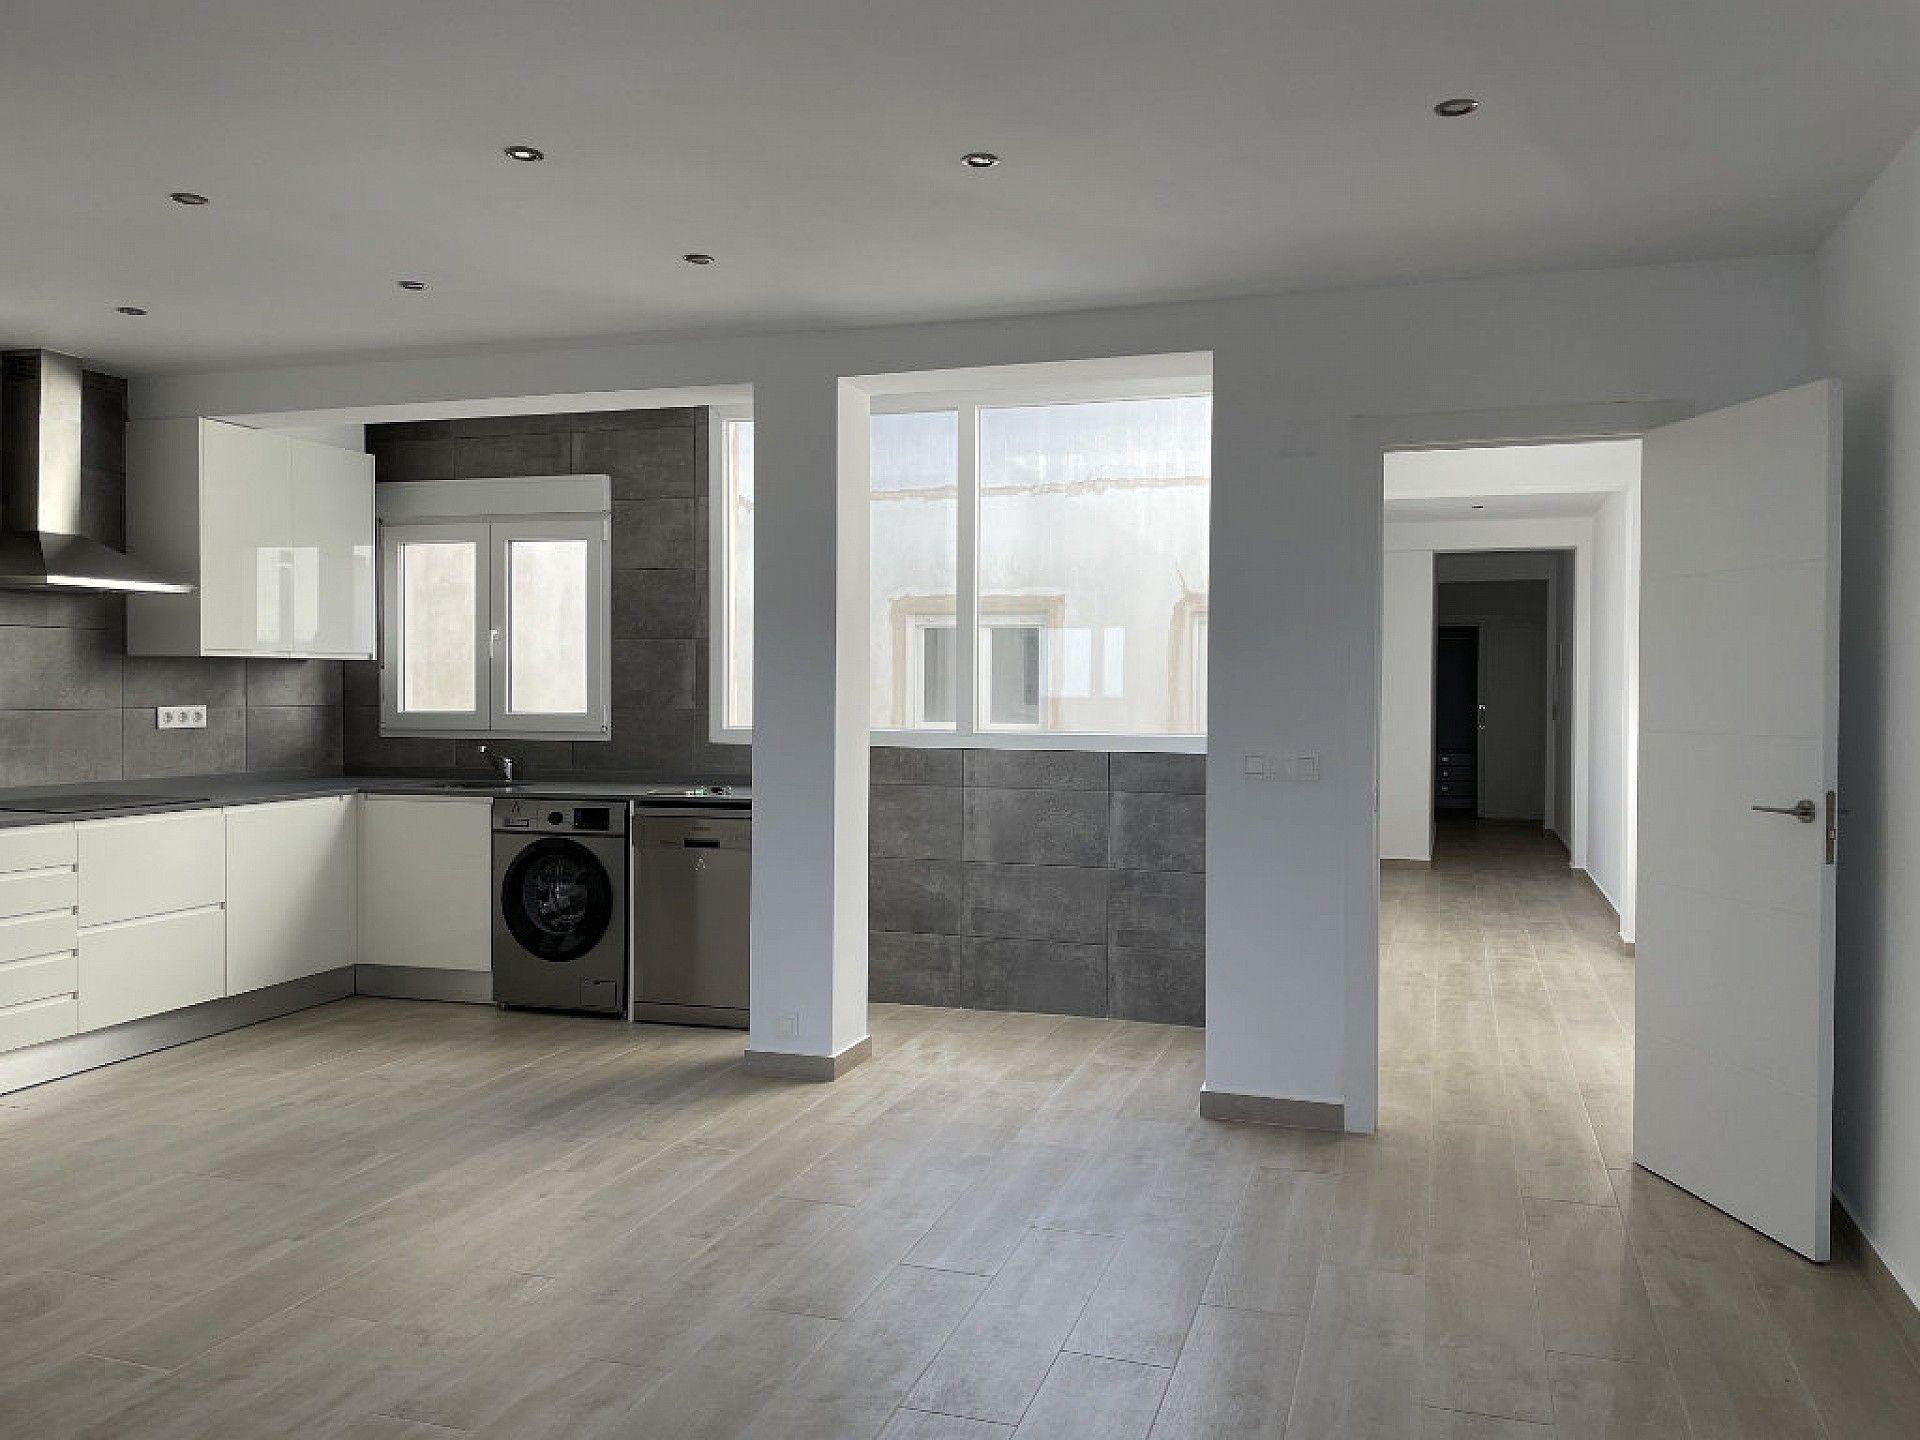 w_appartement-te-koop-costa-blanca-benissa-spanje-a1018-012-2.jpg